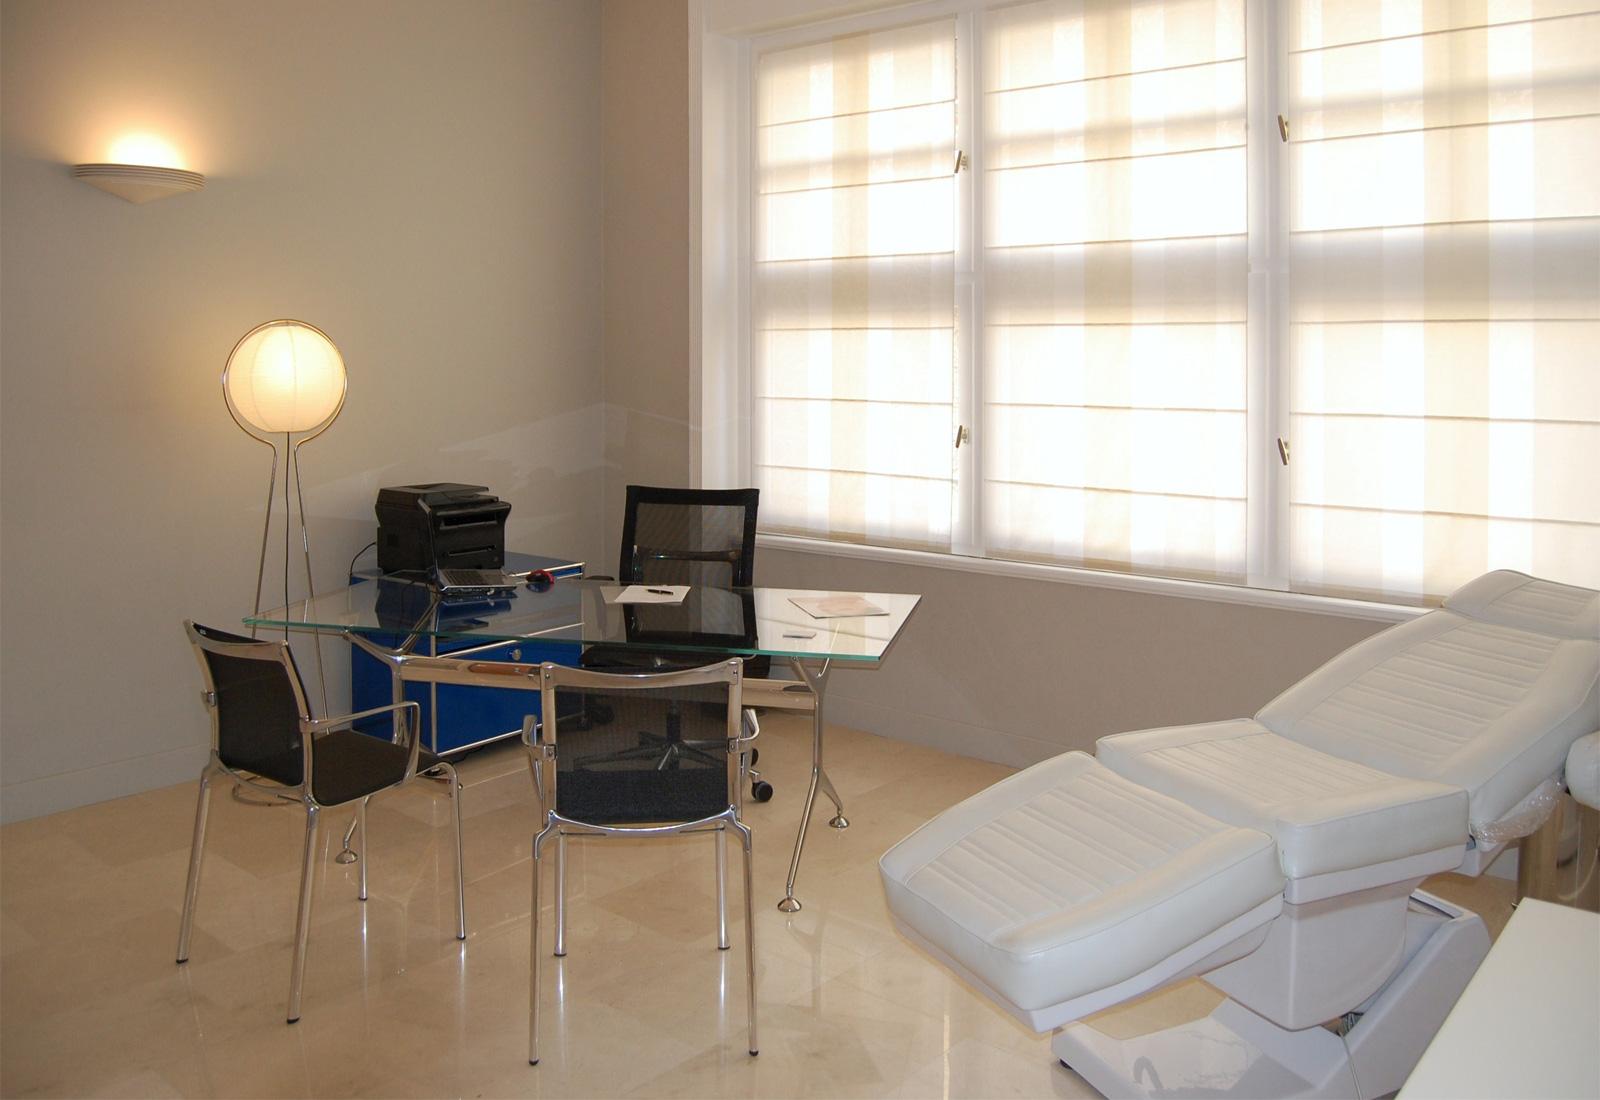 chirurgien esth tique lyon dr bayol sp cialiste de la chirurgie plastique lyon. Black Bedroom Furniture Sets. Home Design Ideas